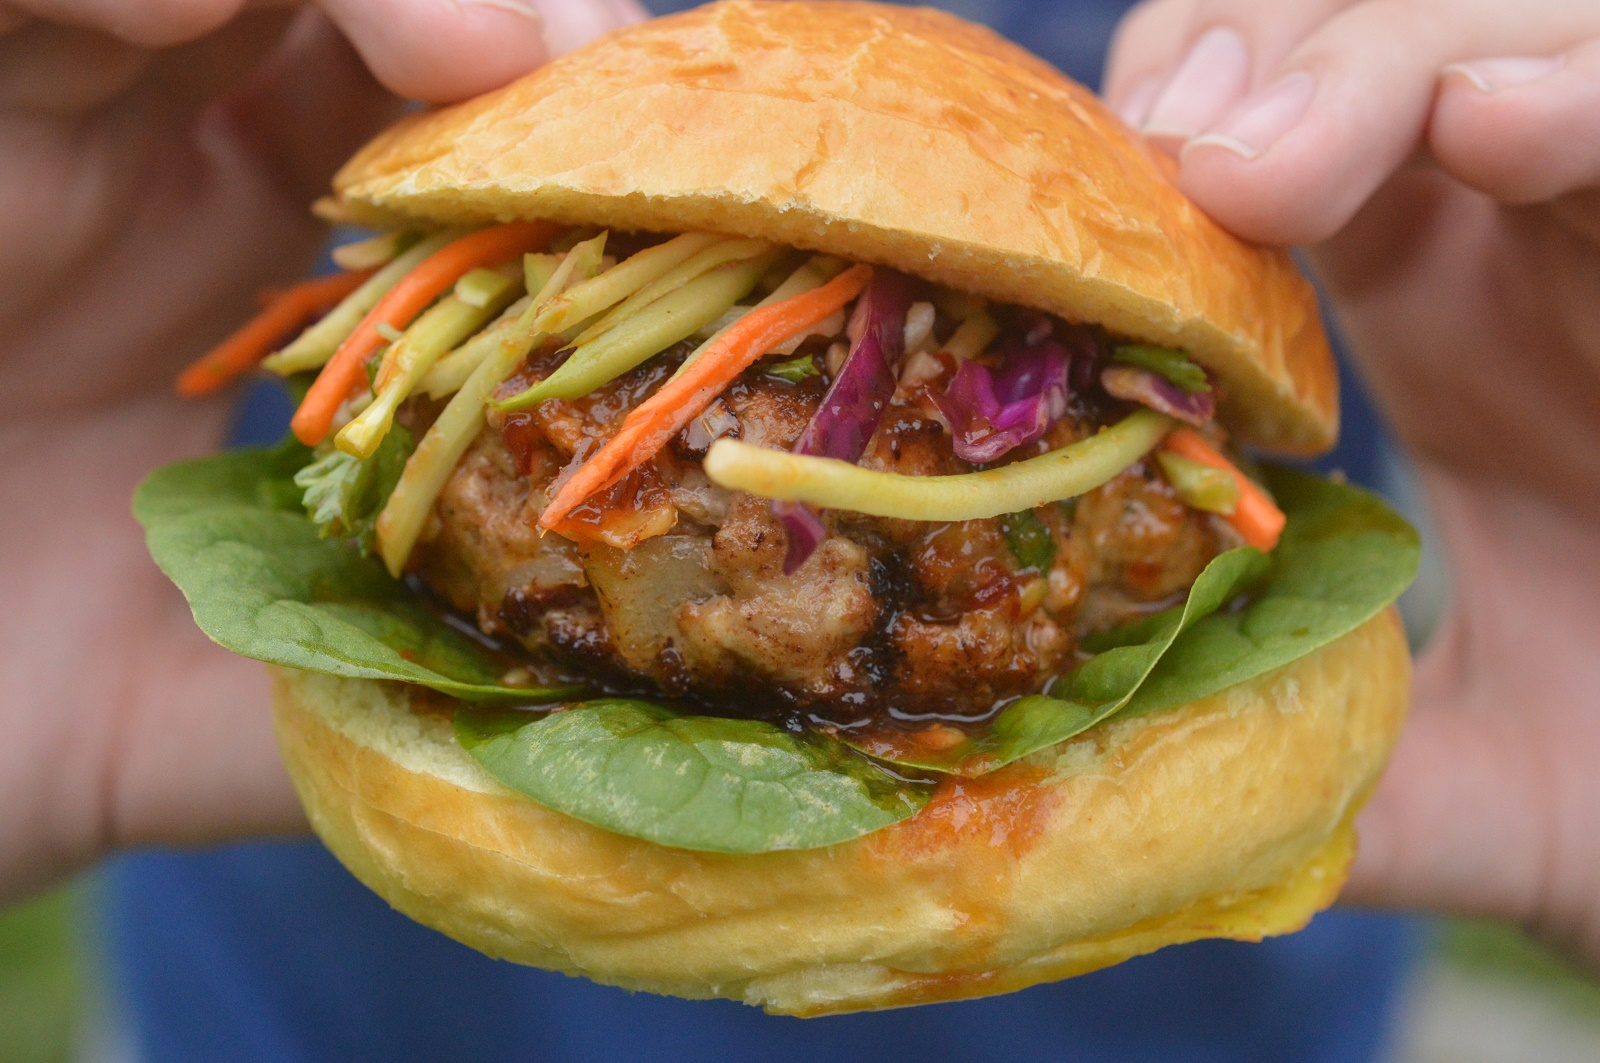 Delicious Asian Pork Burger with Ginger Honey Glaze